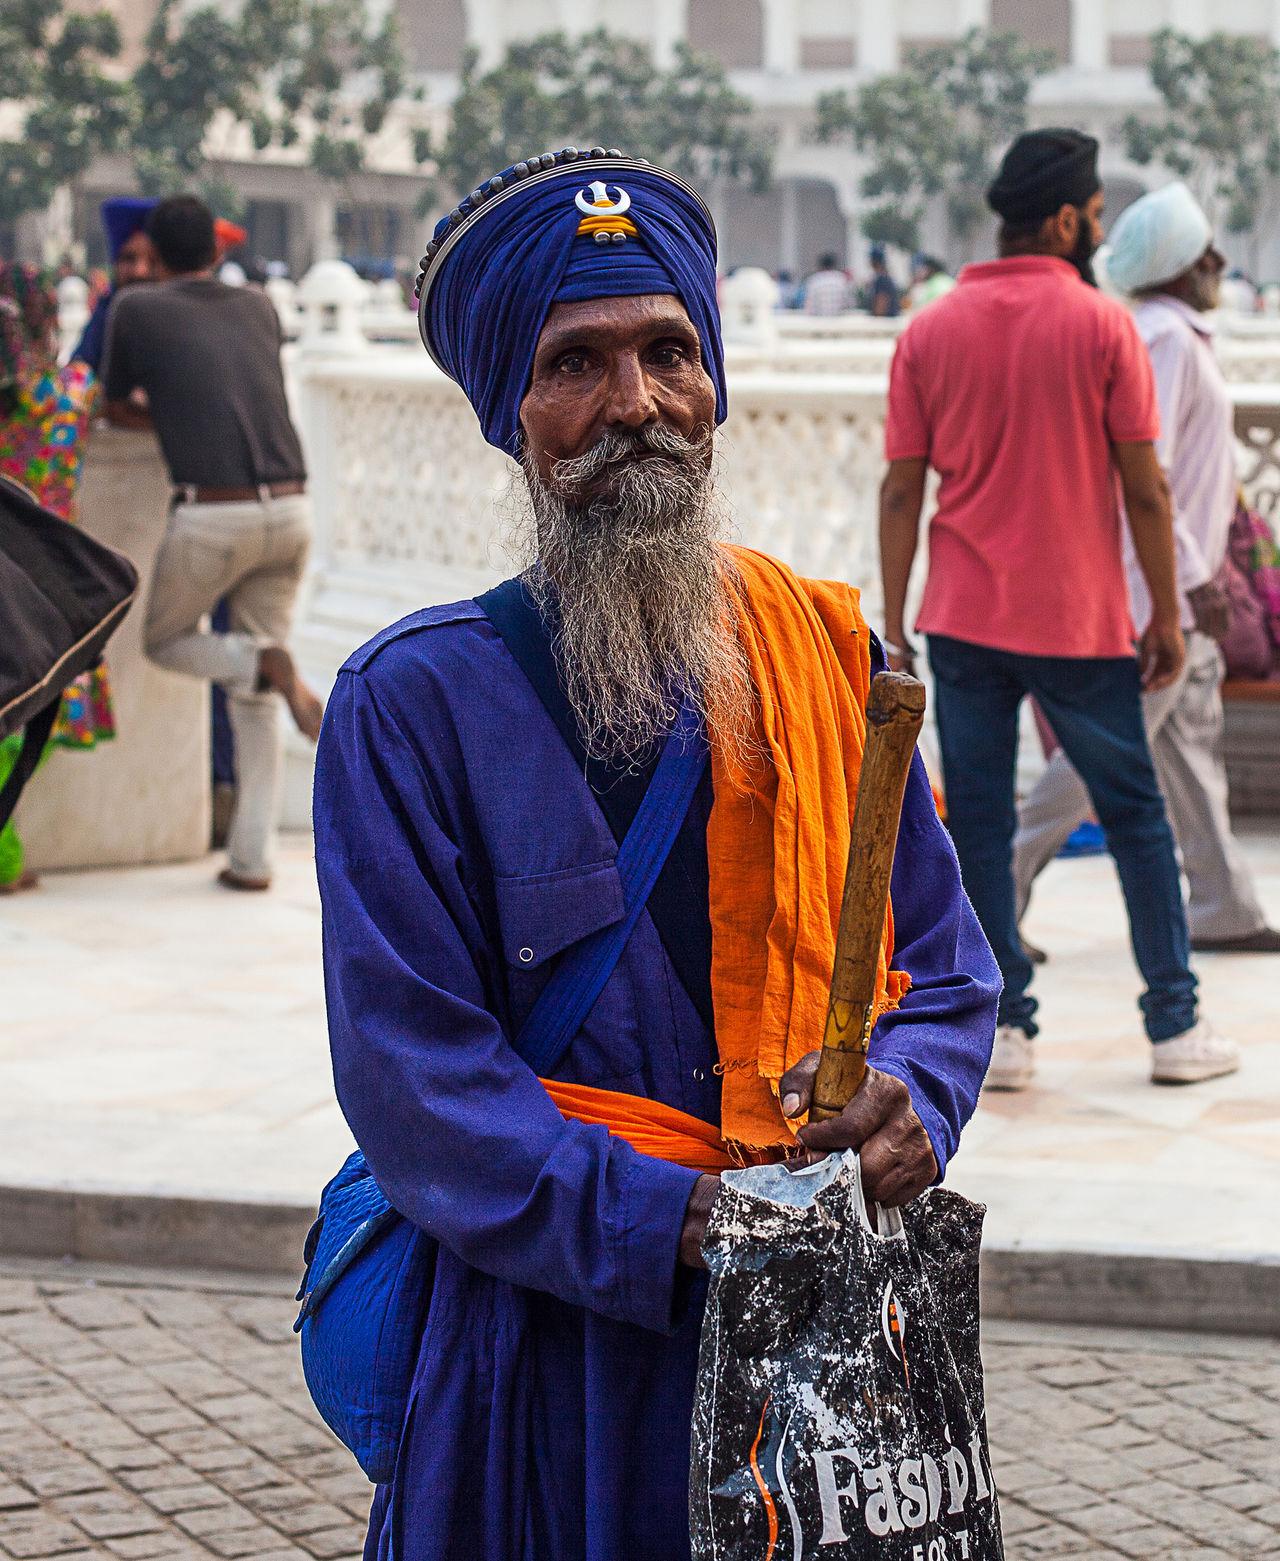 Fascinating guru sikhs Lifestyles Males  Beard Adults Only Men Adult City People Only Men Outdoors Human Body Part Day India Indian Sikh Sikhism Guru Gurudwara Golden Temple Amritsar Punjab Portrait